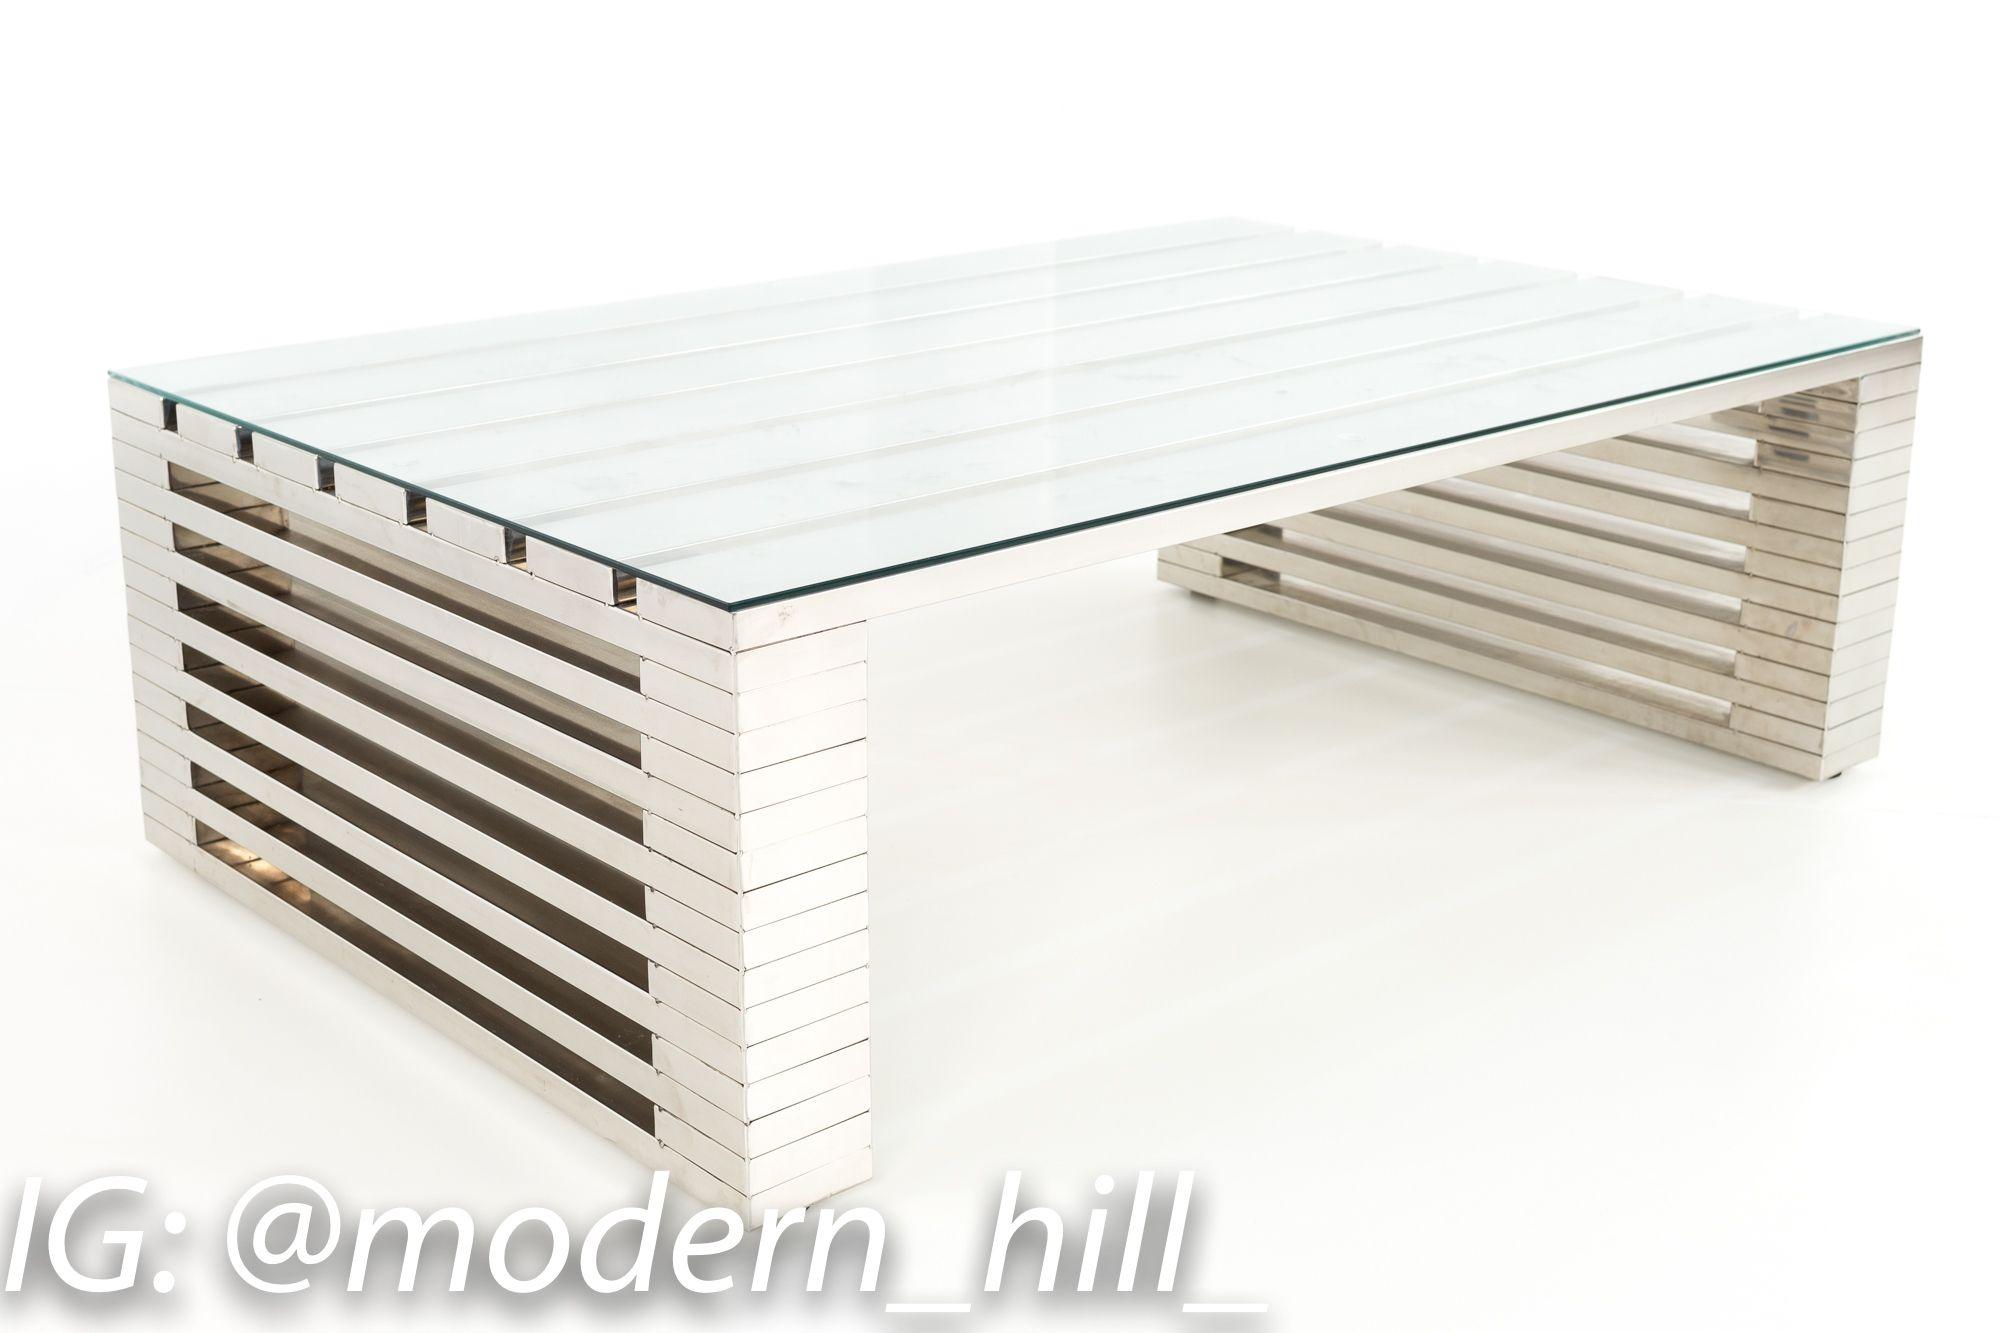 Timothy Oulton Zazenne Mid Century Modern Steel And Glass Coffee Table Glass Coffee Table Coffee Table Mid Century Modern [ 1333 x 2000 Pixel ]